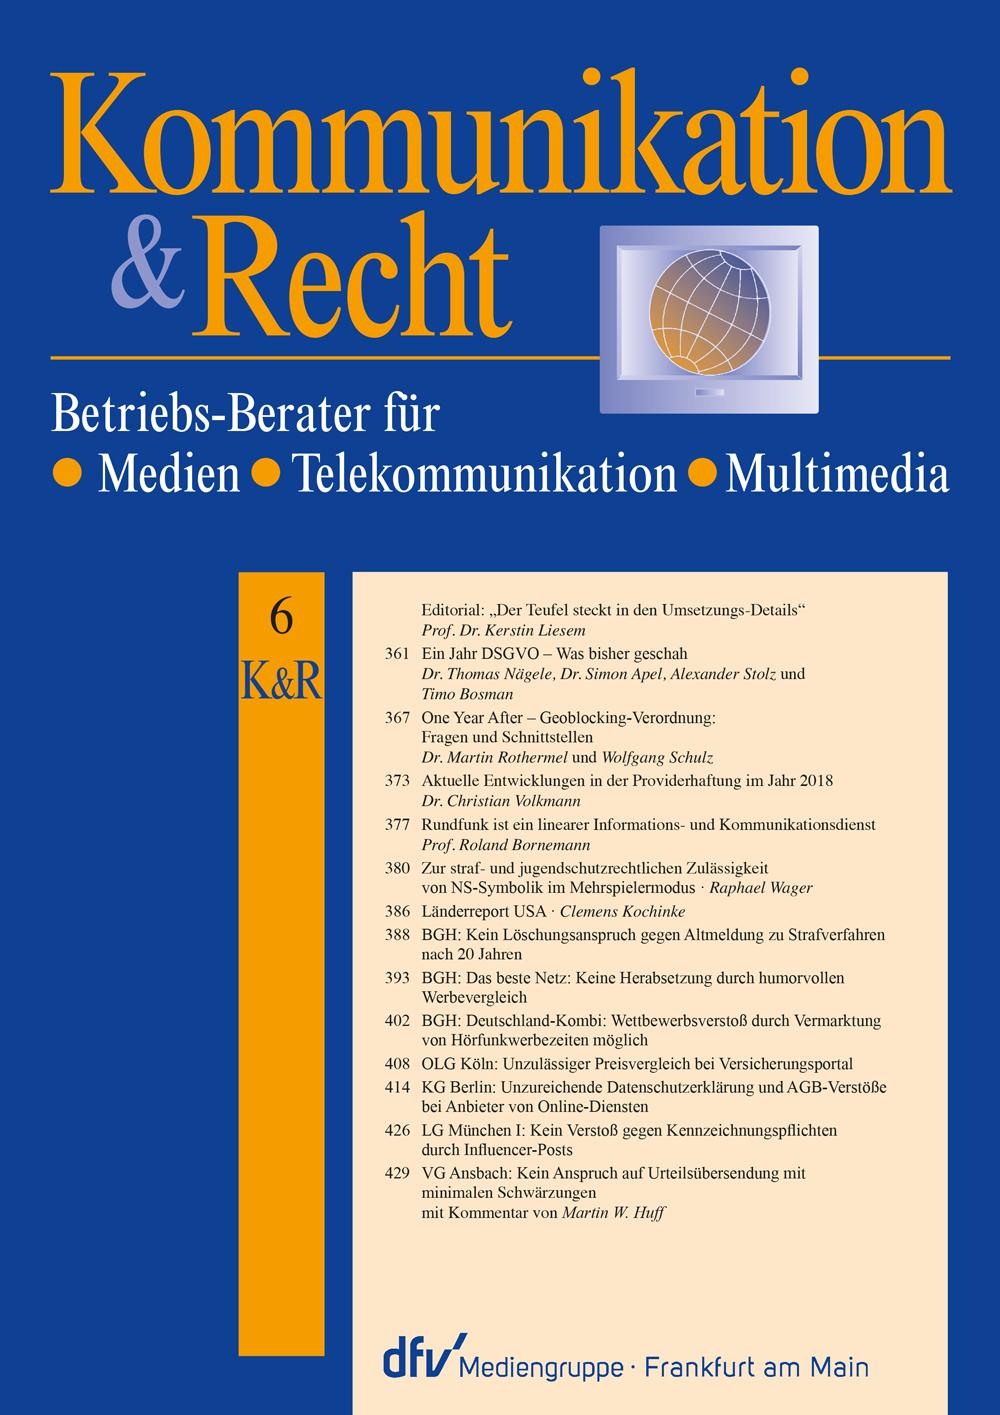 Kommunikation & Recht